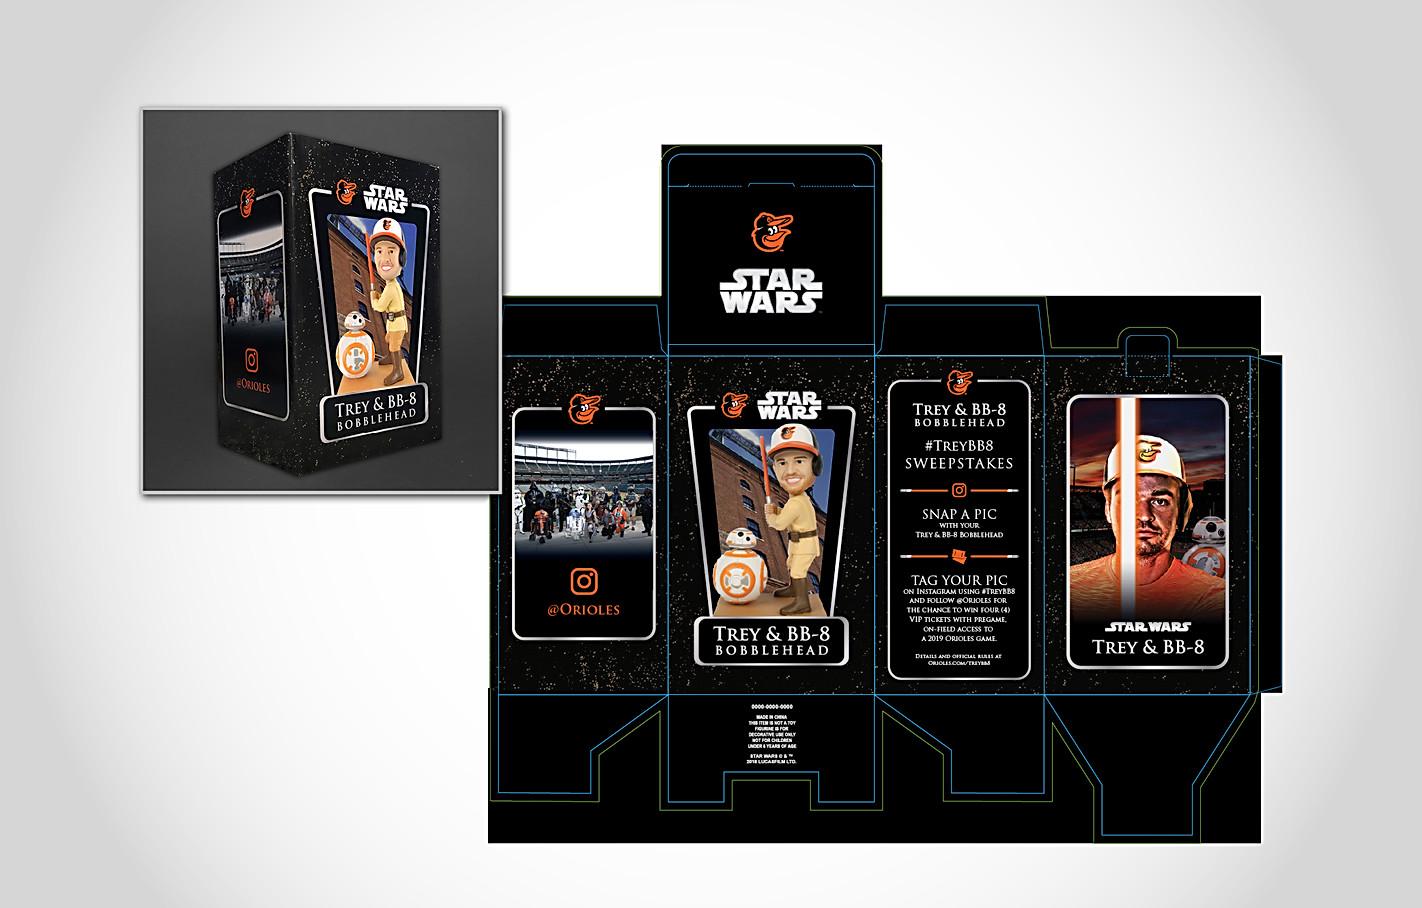 Orioles Star Wars Trey & BB-8 Bobblehead Packaging